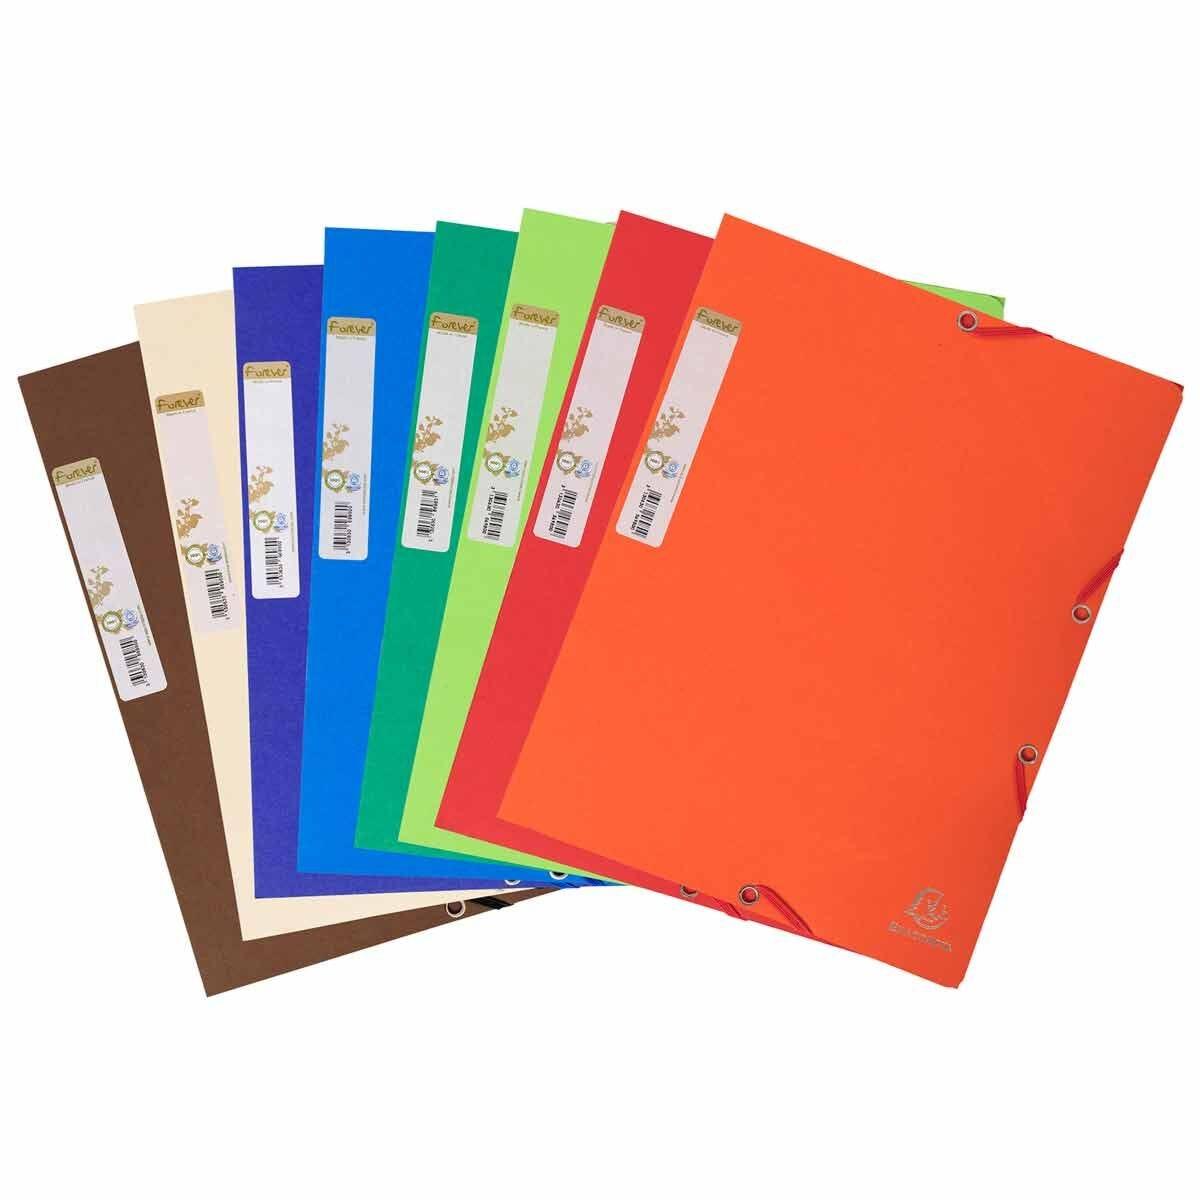 Exacompta Forever Elasticated 3 Flap Folder A4 380gsm Pack of 25